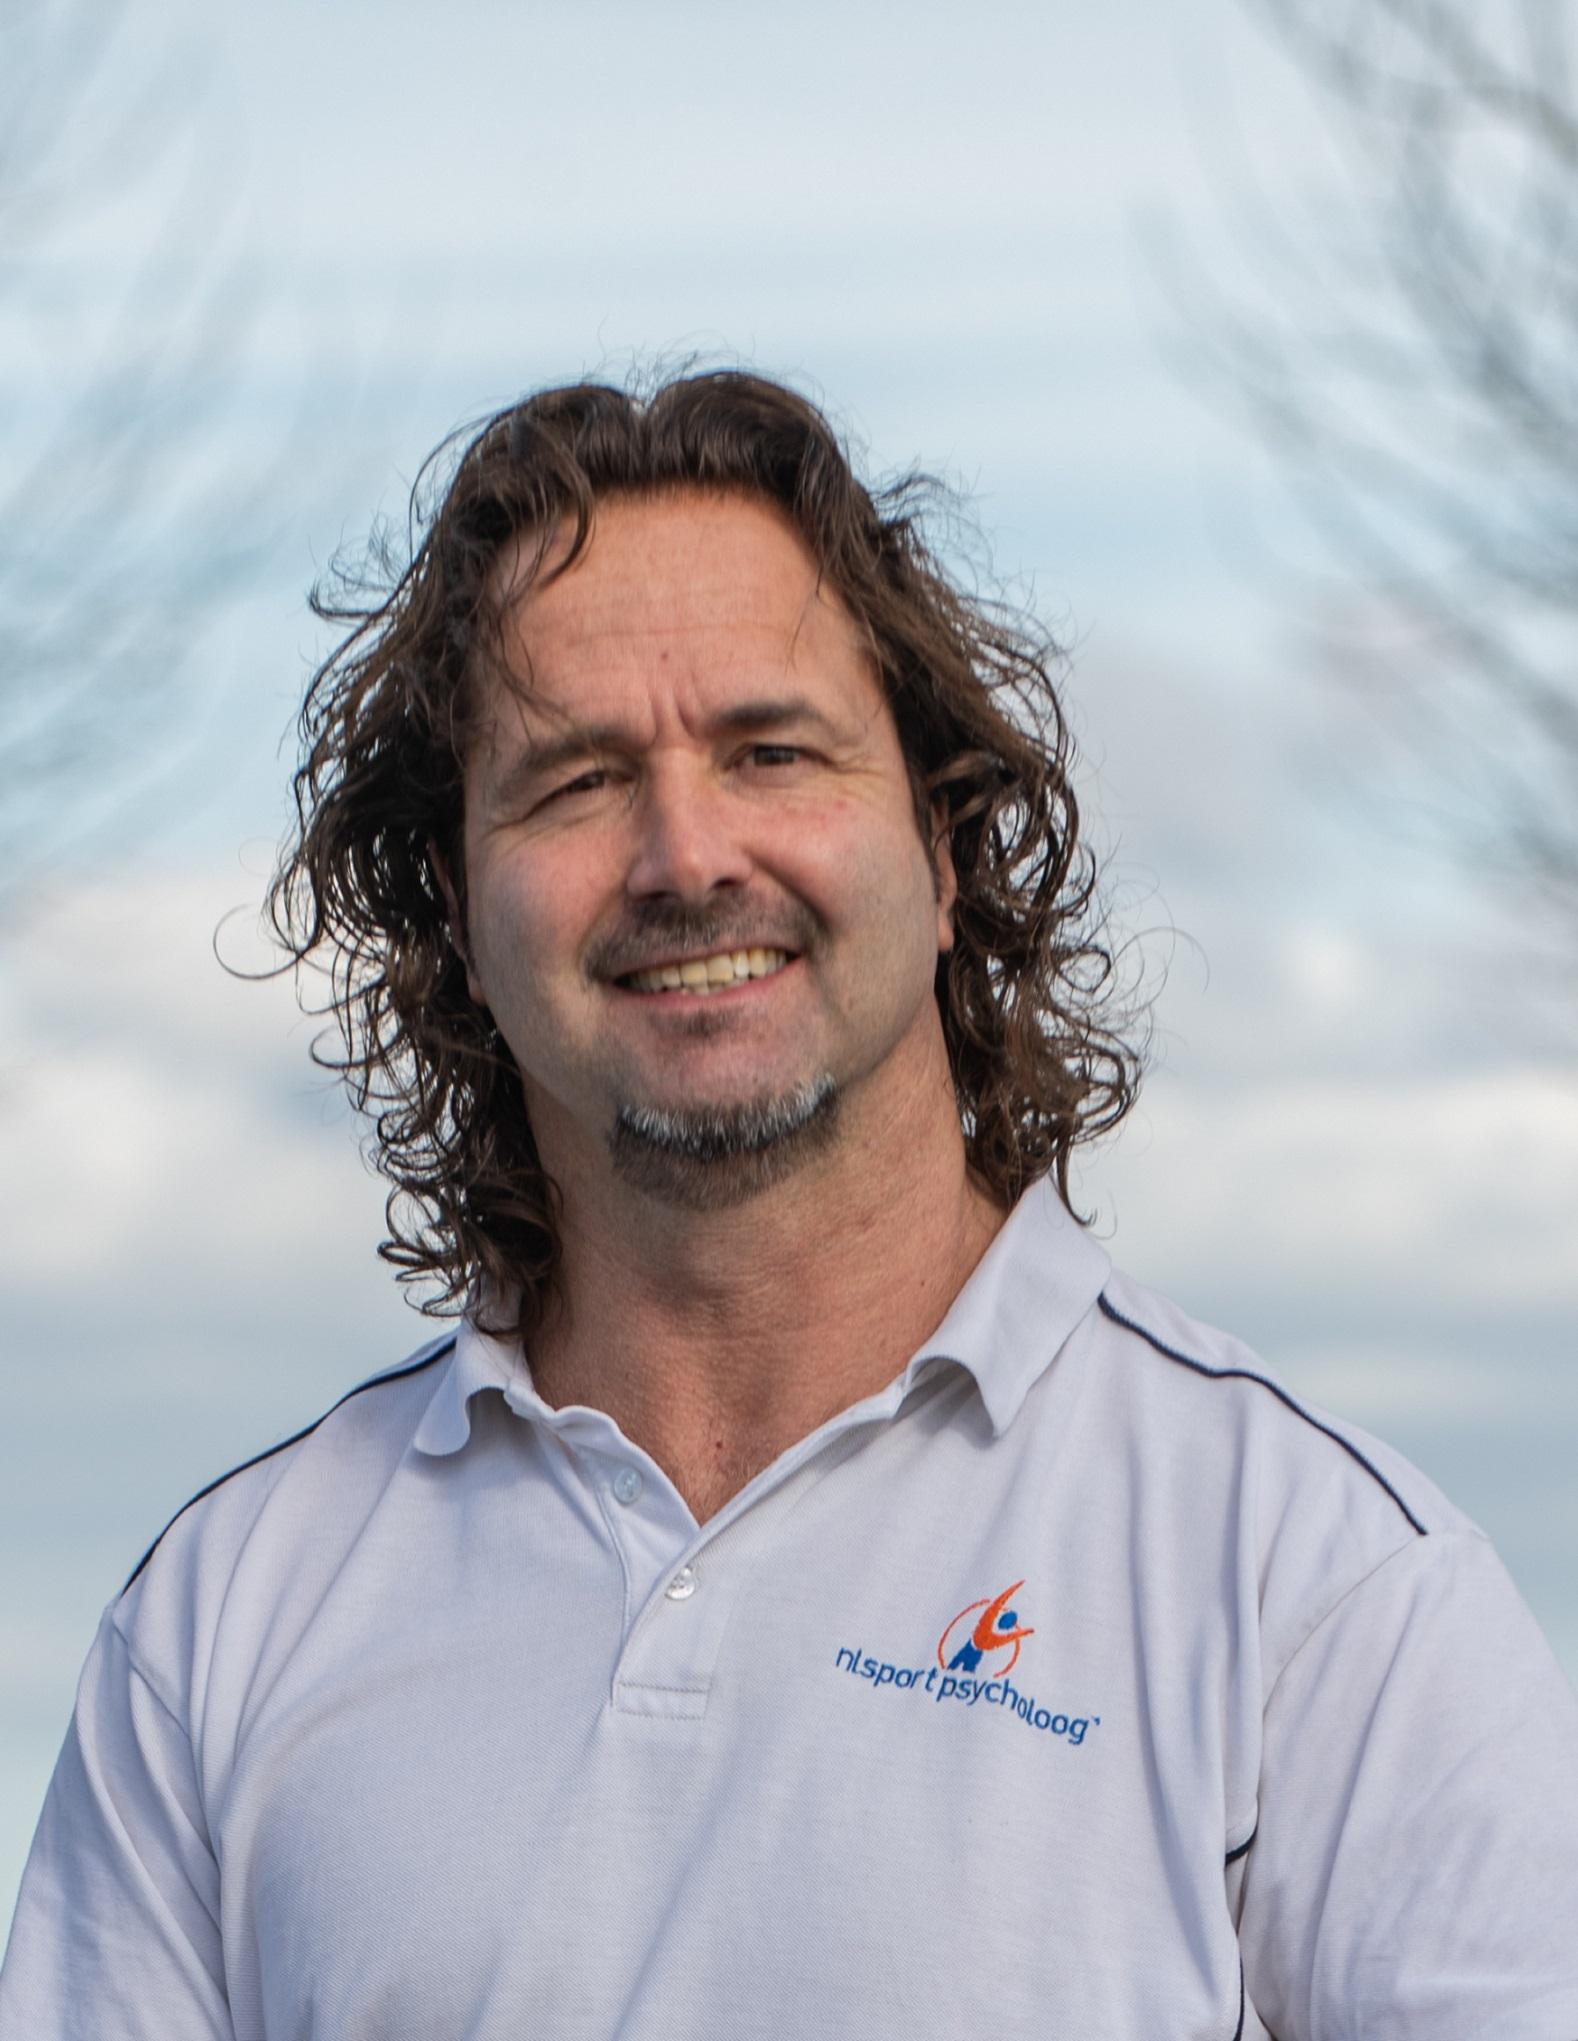 NL sportpsycholoog Jan Sleijfer – Noord Holland